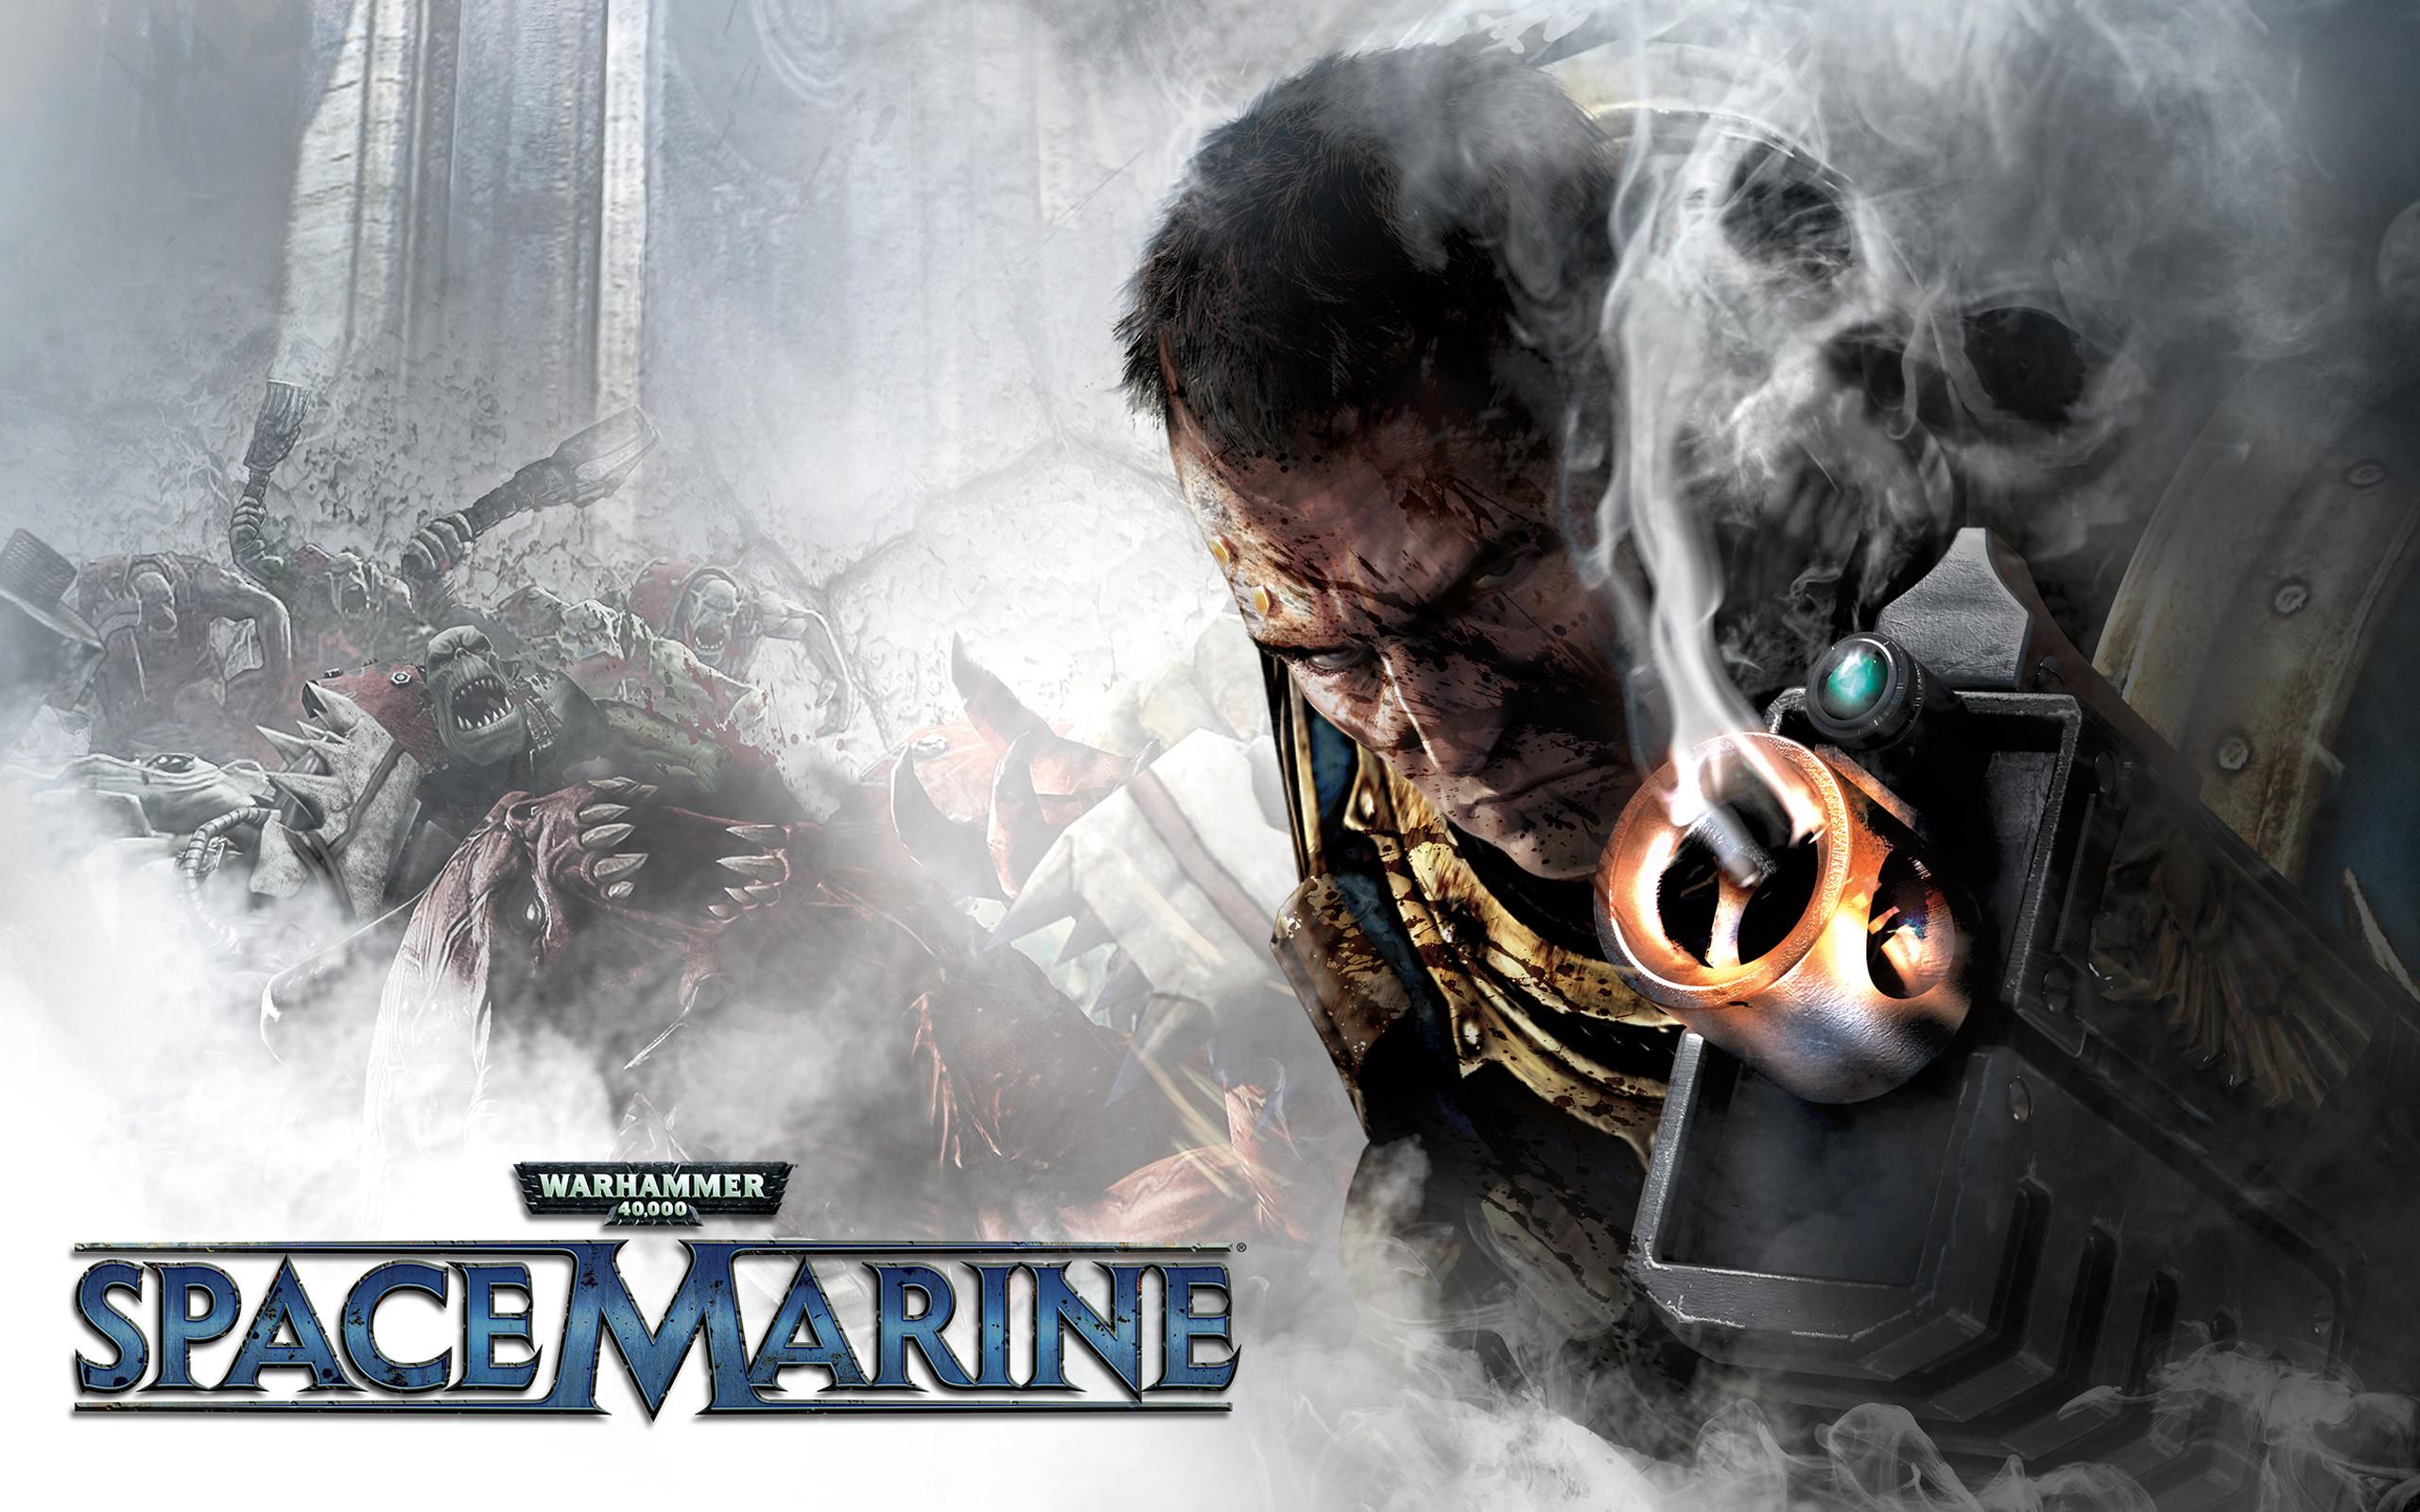 Warhammer Space Marine Game